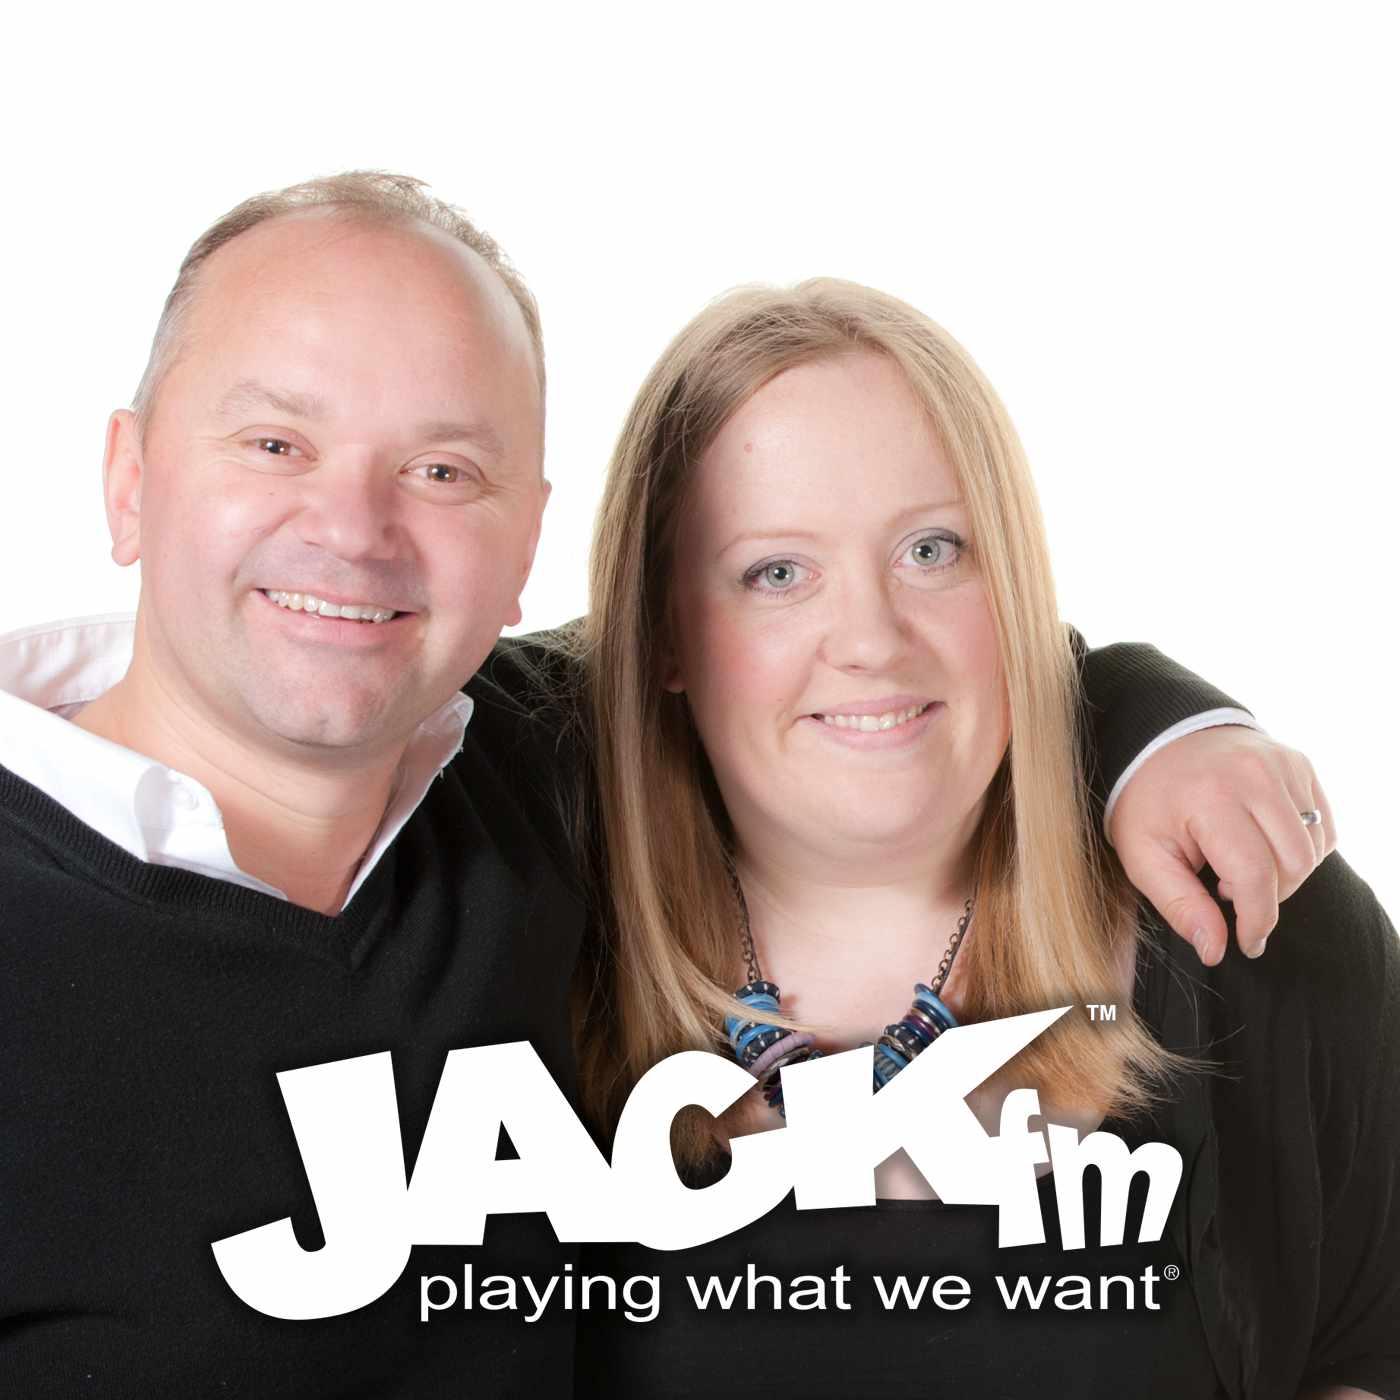 Jack fm swindon dating